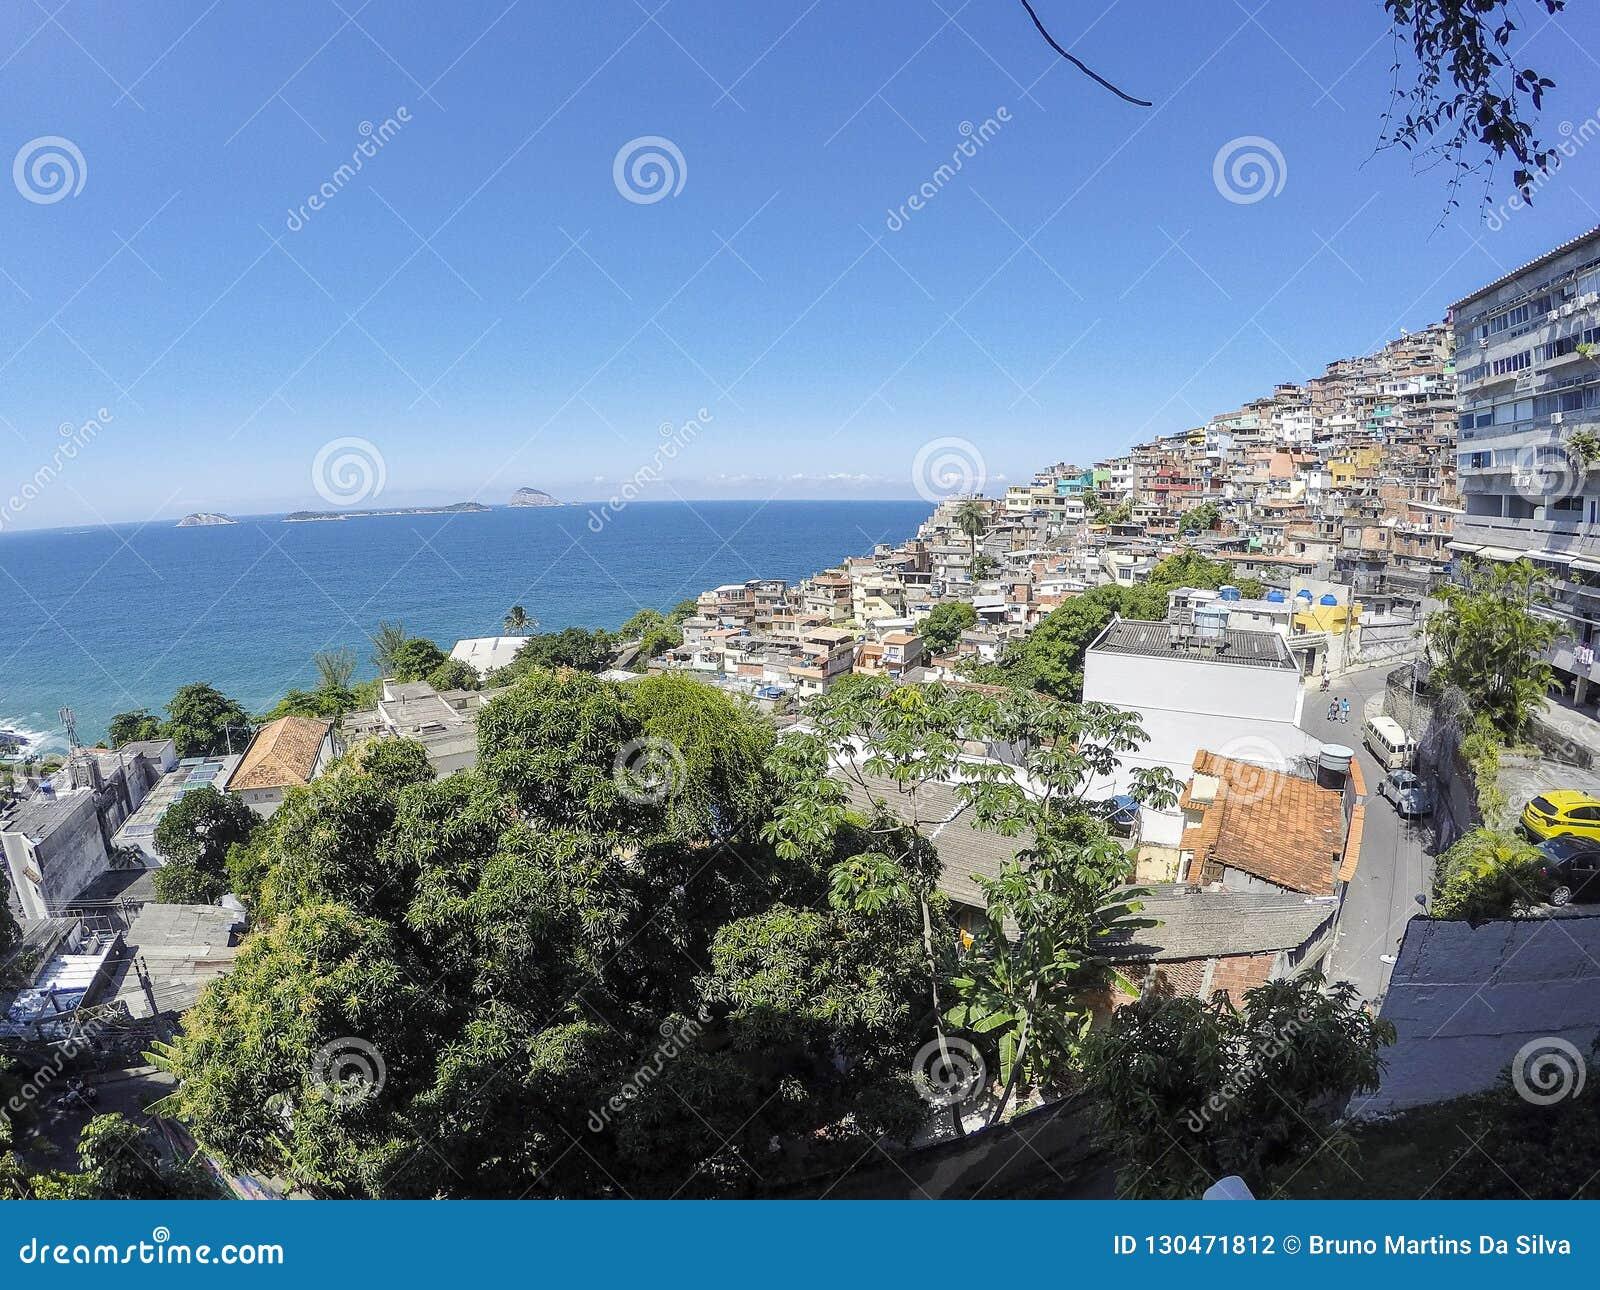 Detalles de la colina de Vidigal en Rio de Janeiro